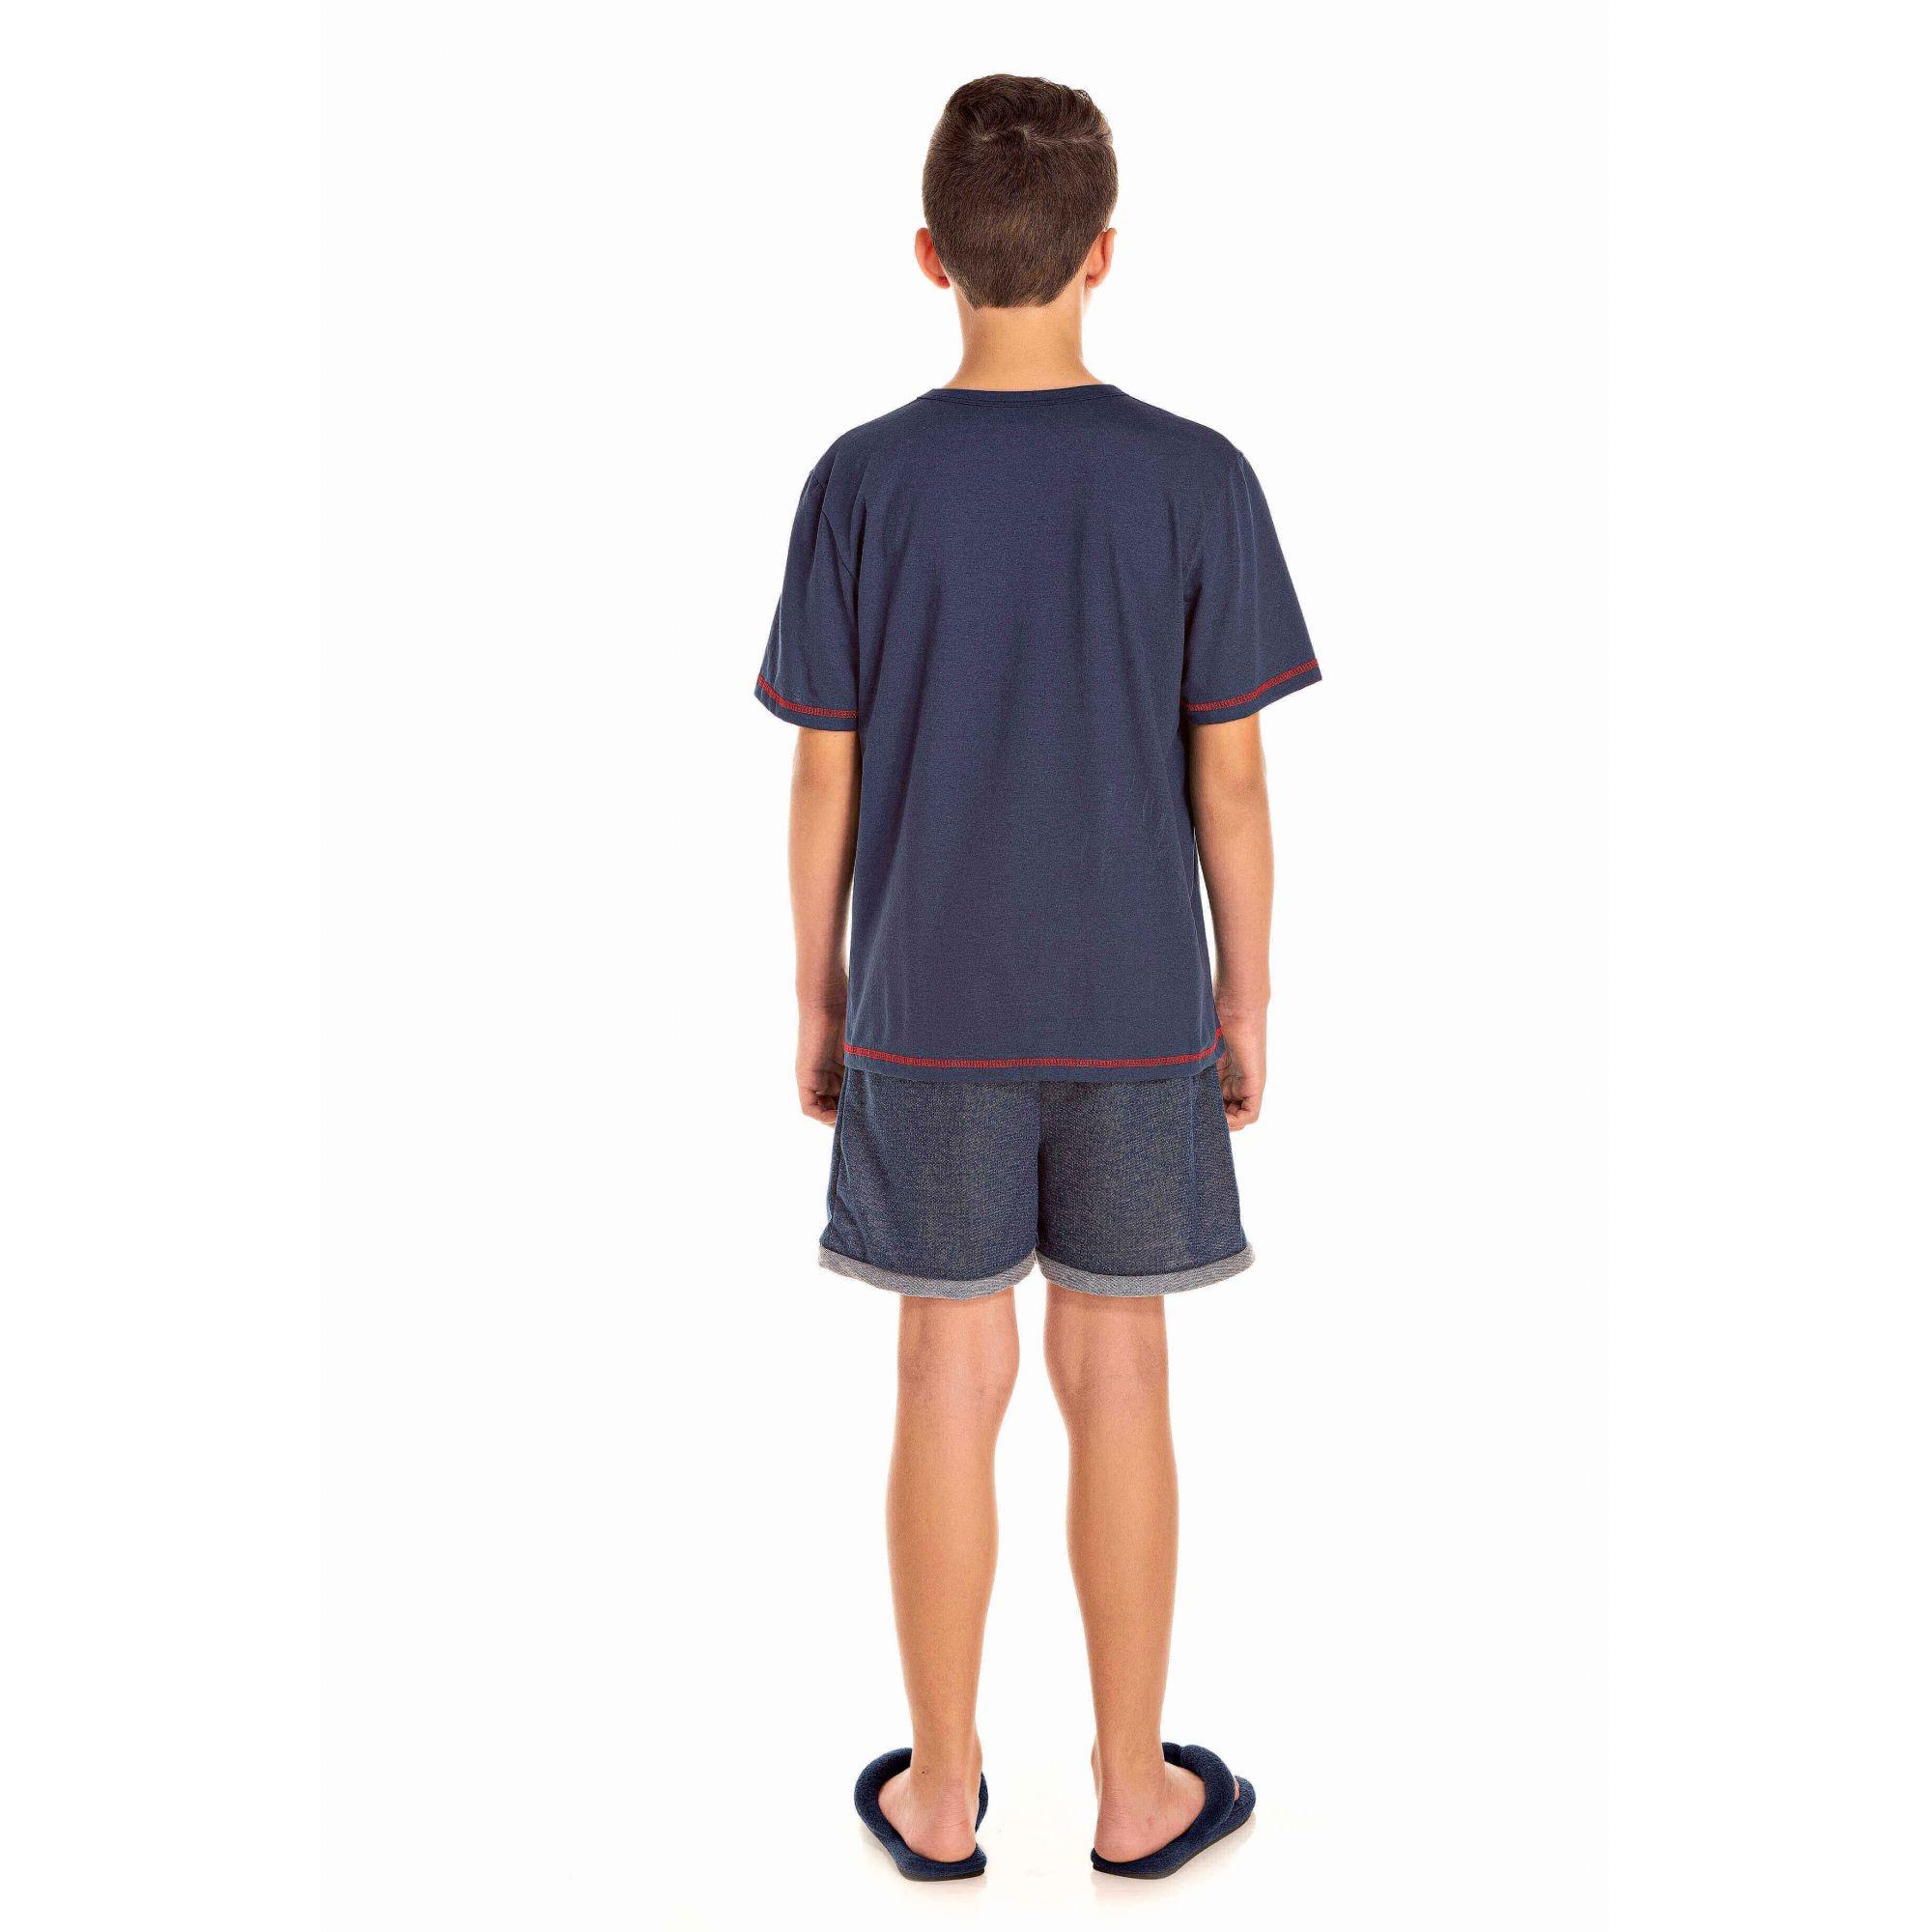 107/E - Pijama Juvenil Masculino Hey Sailor - Marinho